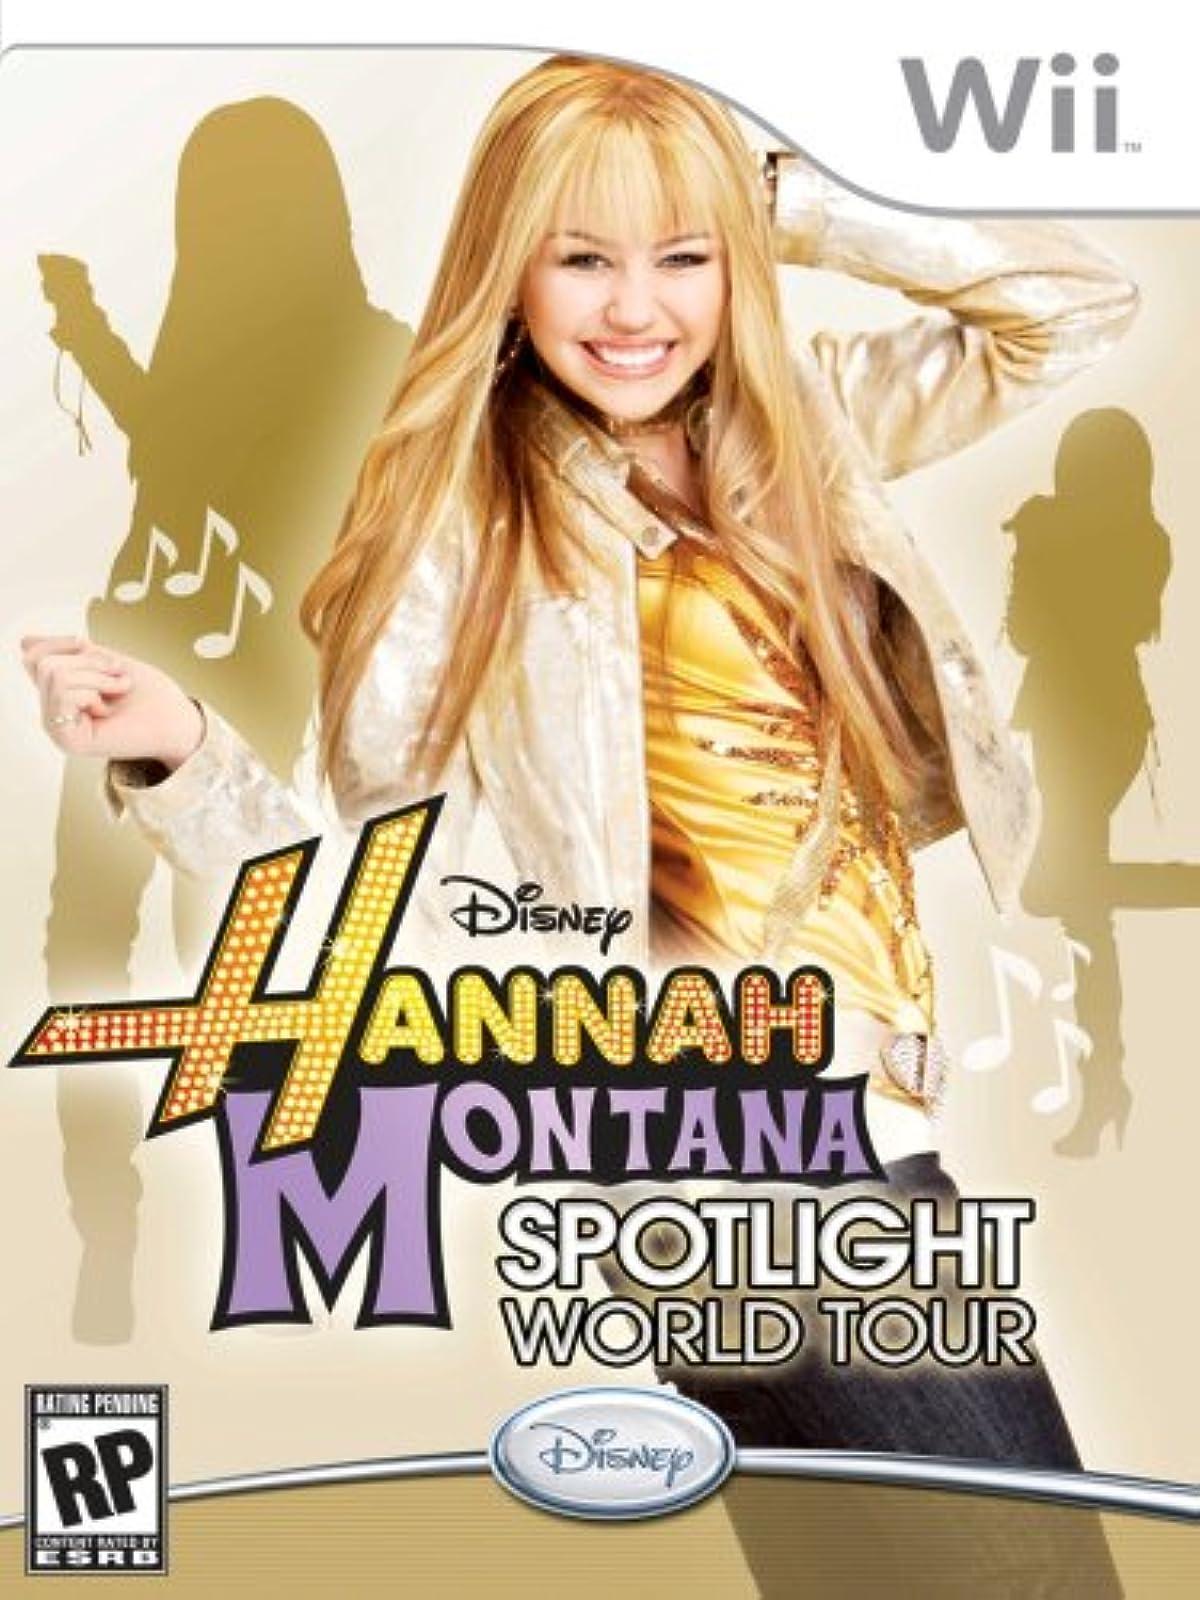 Hannah Montana: Spotlight World Tour For Wii And Wii U